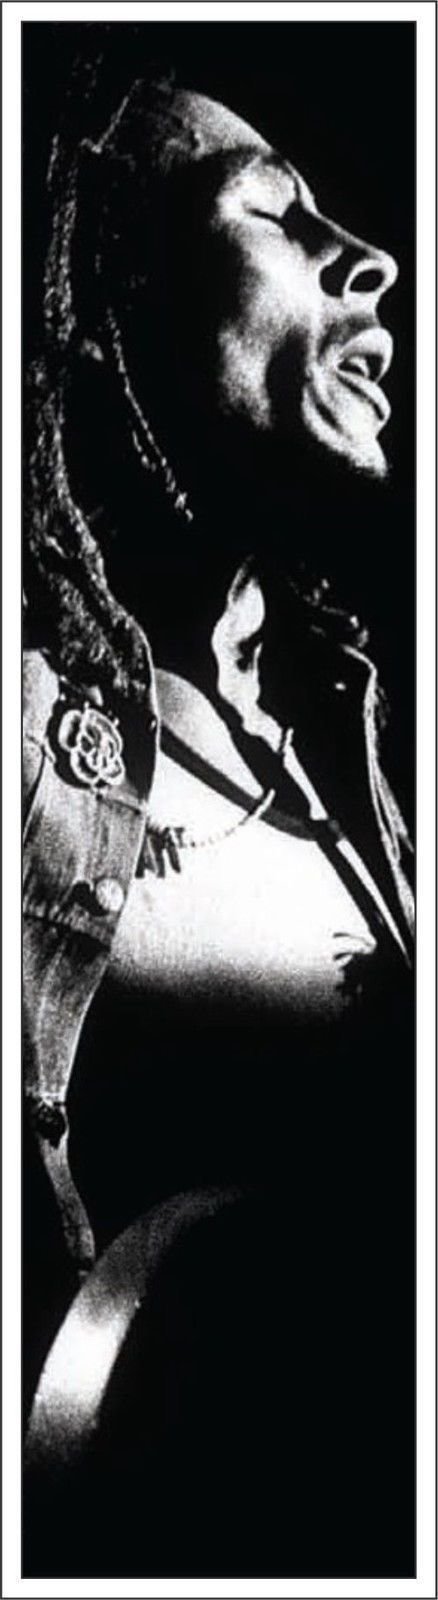 **Bob Marley & The Wailers** Civic Auditorium, Santa Cruz, CA, USA, December 2, 1979. ►For listening: https://youtu.be/7InXZofZId8 ►►More fantastic pictures, music and videos of *Robert Nesta Marley & His Wailers* on: https://de.pinterest.com/ReggaeHeart/ ©Neal Preston